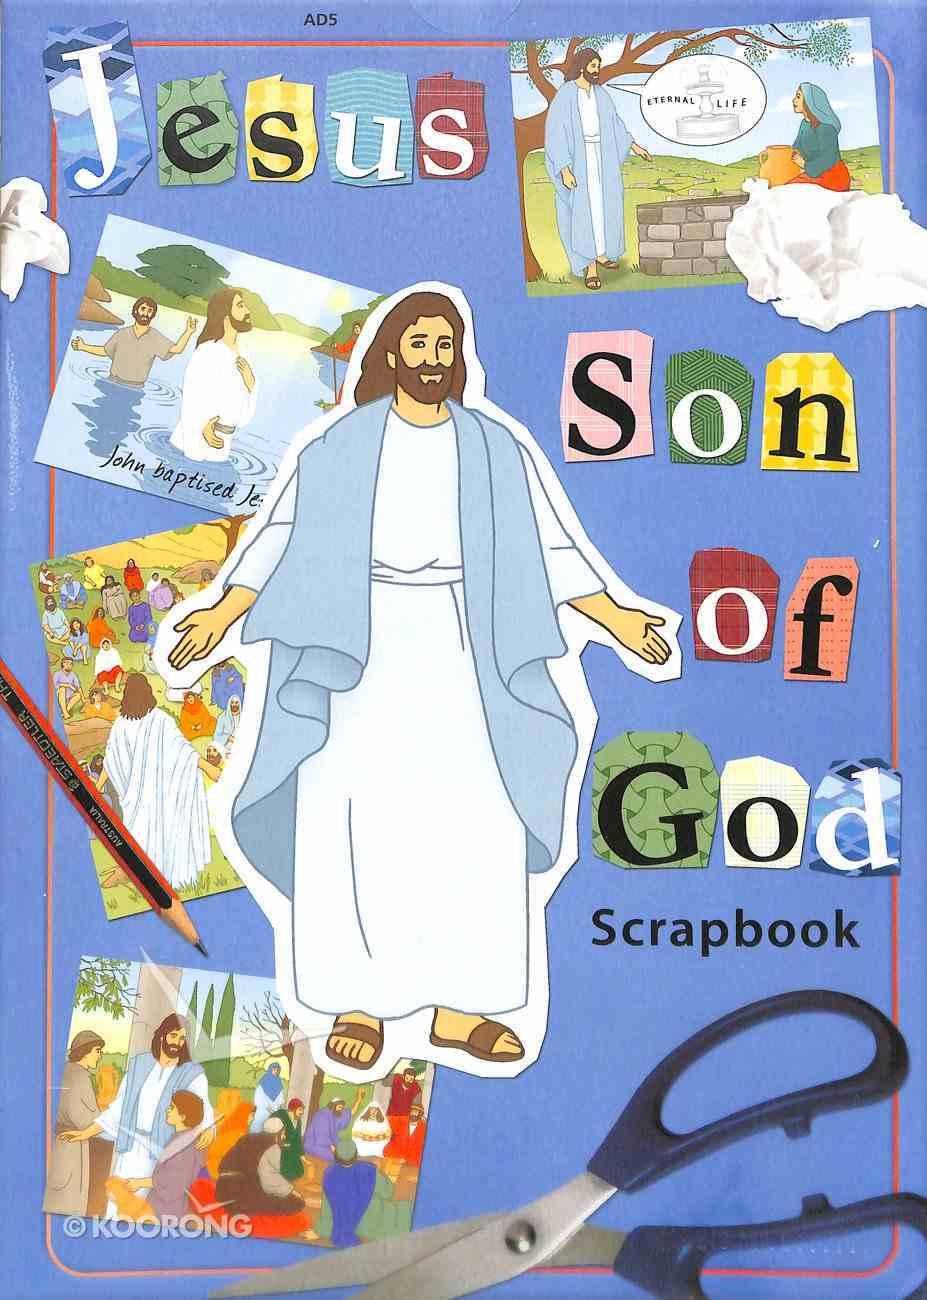 Kids@Church 05: Ad5 Ages 5-7 Teacher's Manual (Adventure) (Kids@church Curriculum Series) Spiral